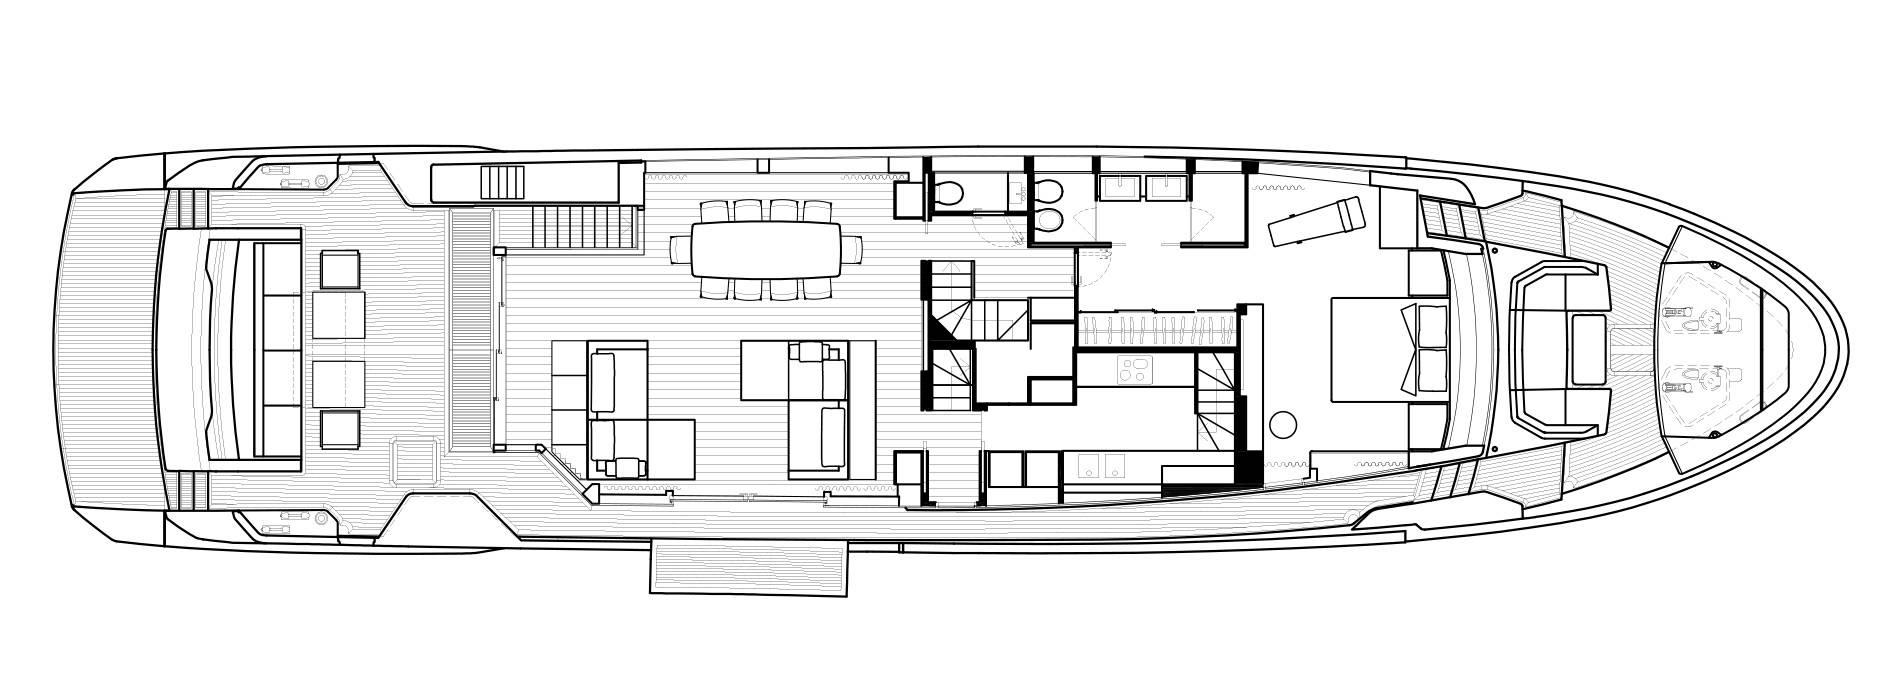 Sanlorenzo Yachts SL102 Asymmetric Hauptdeck